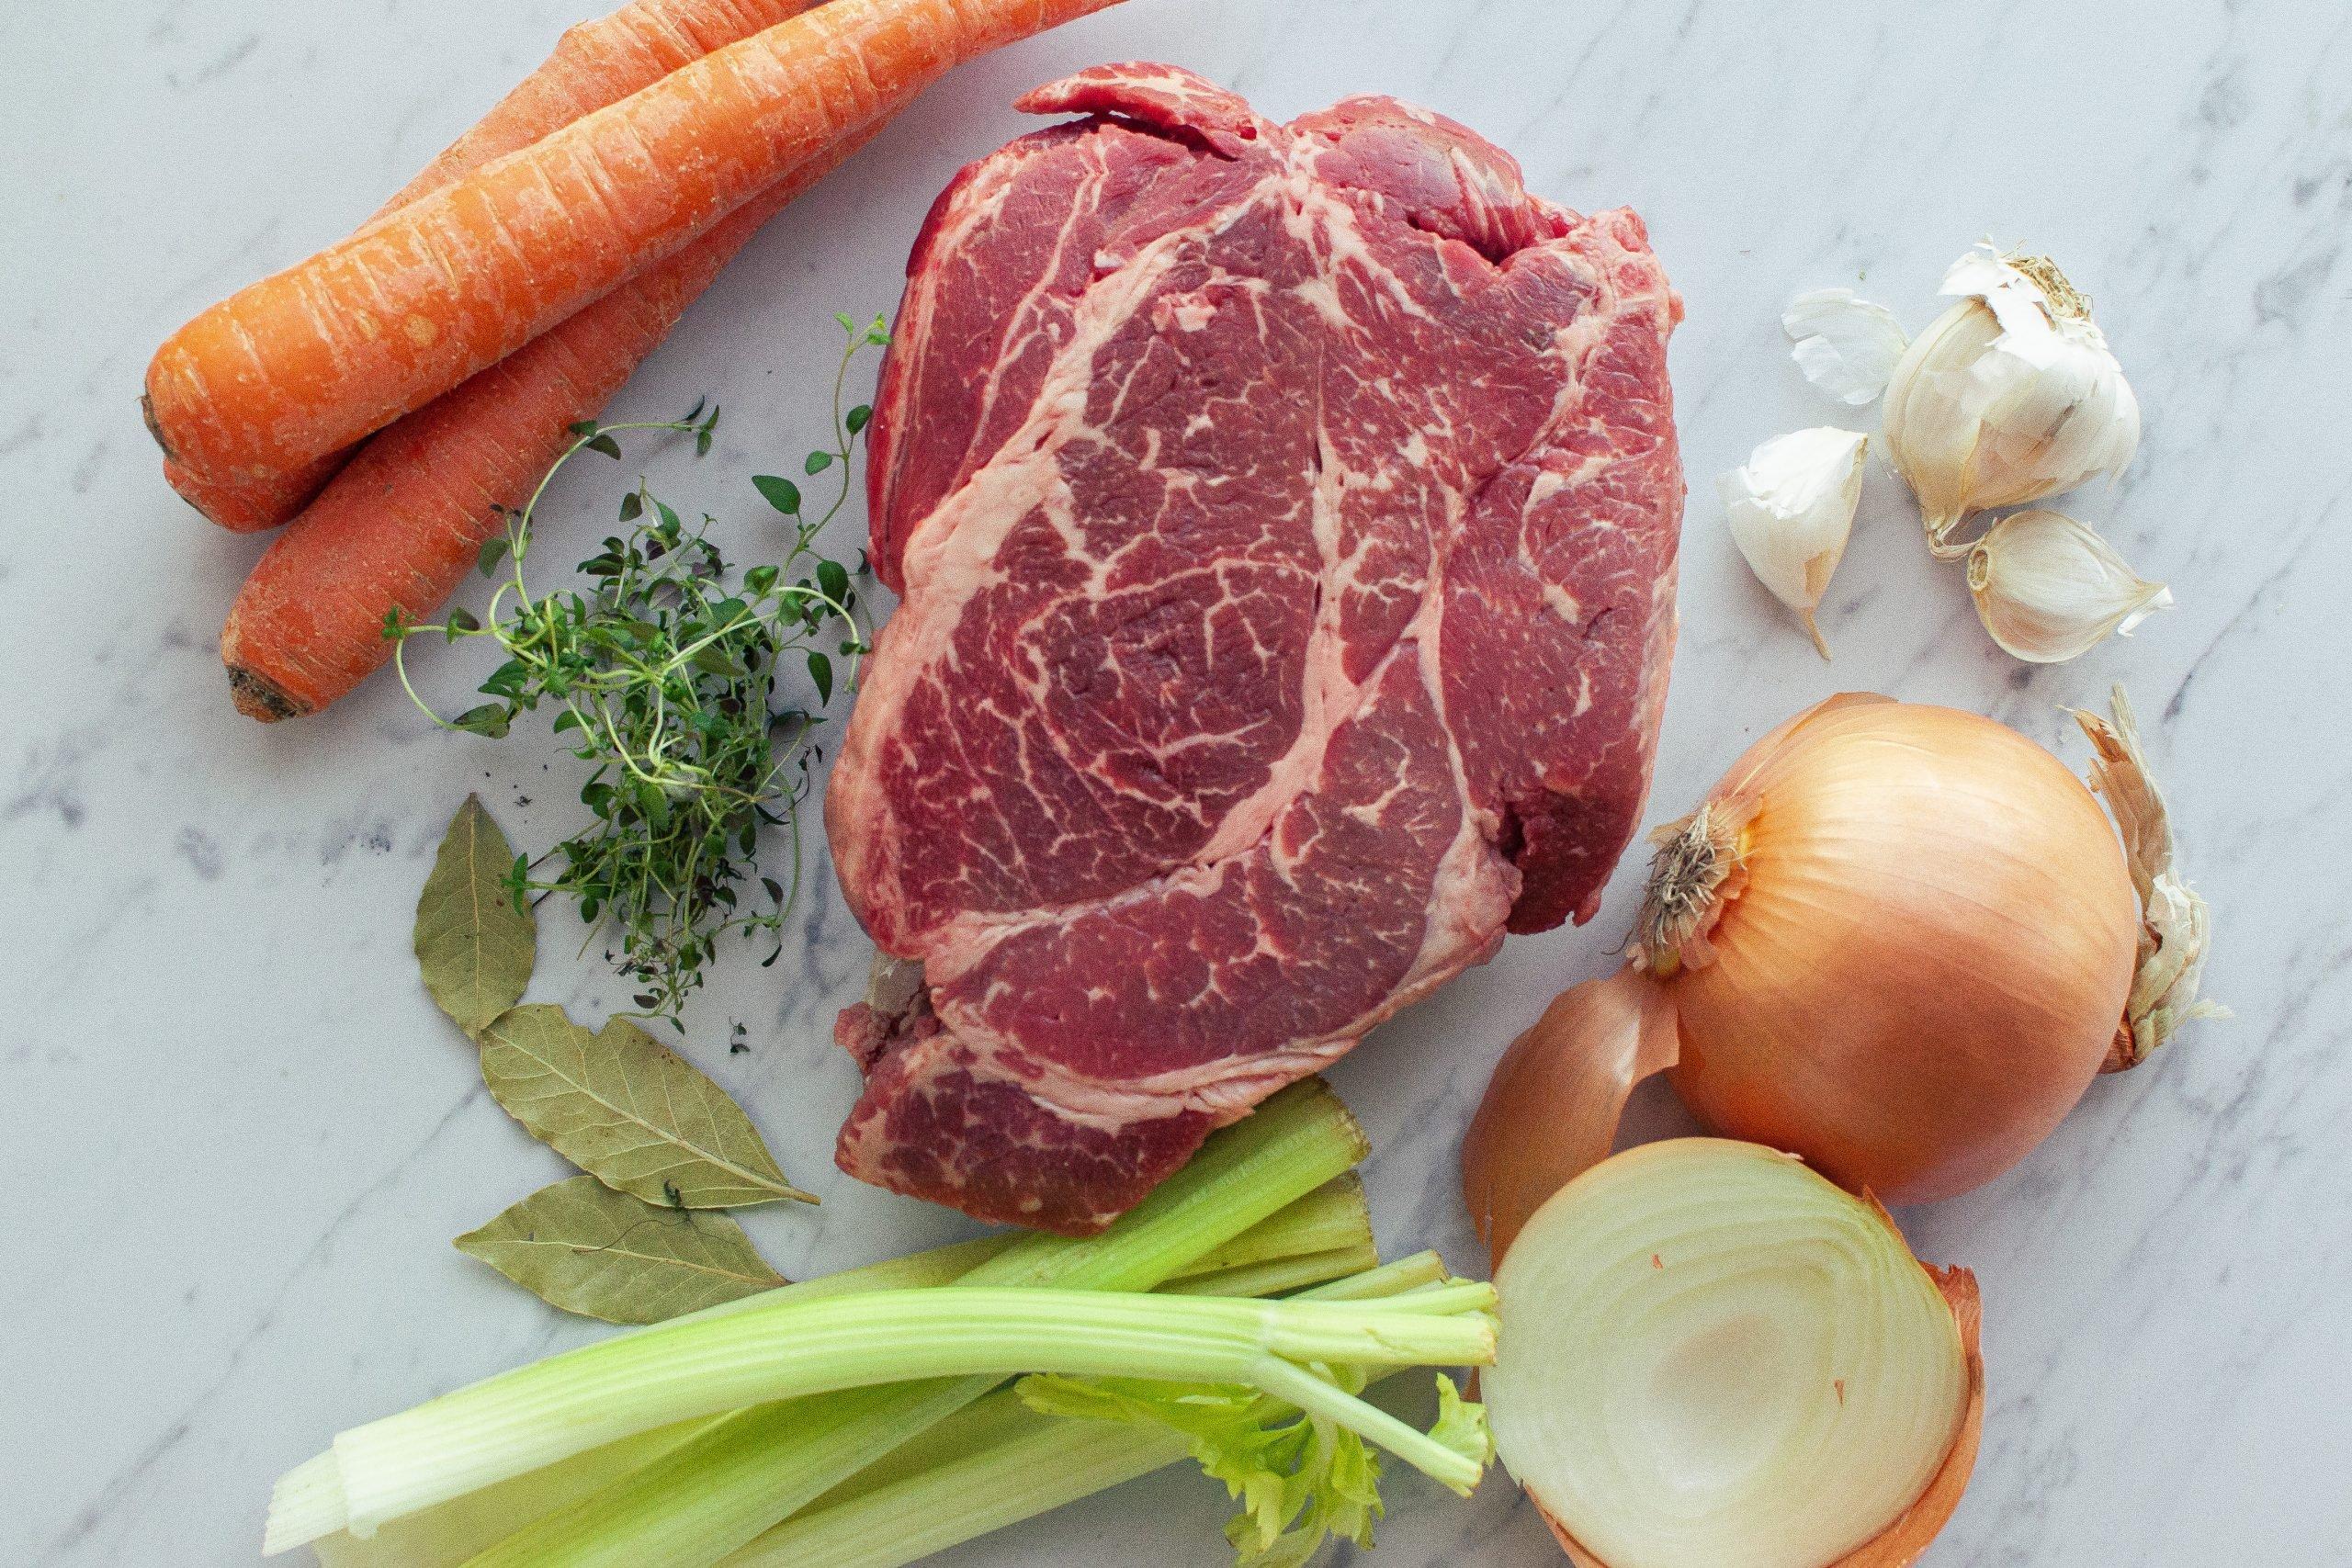 Ingredients for braised beef. Roast, onion, garlic, celery, carrots, thyme, bay leaves